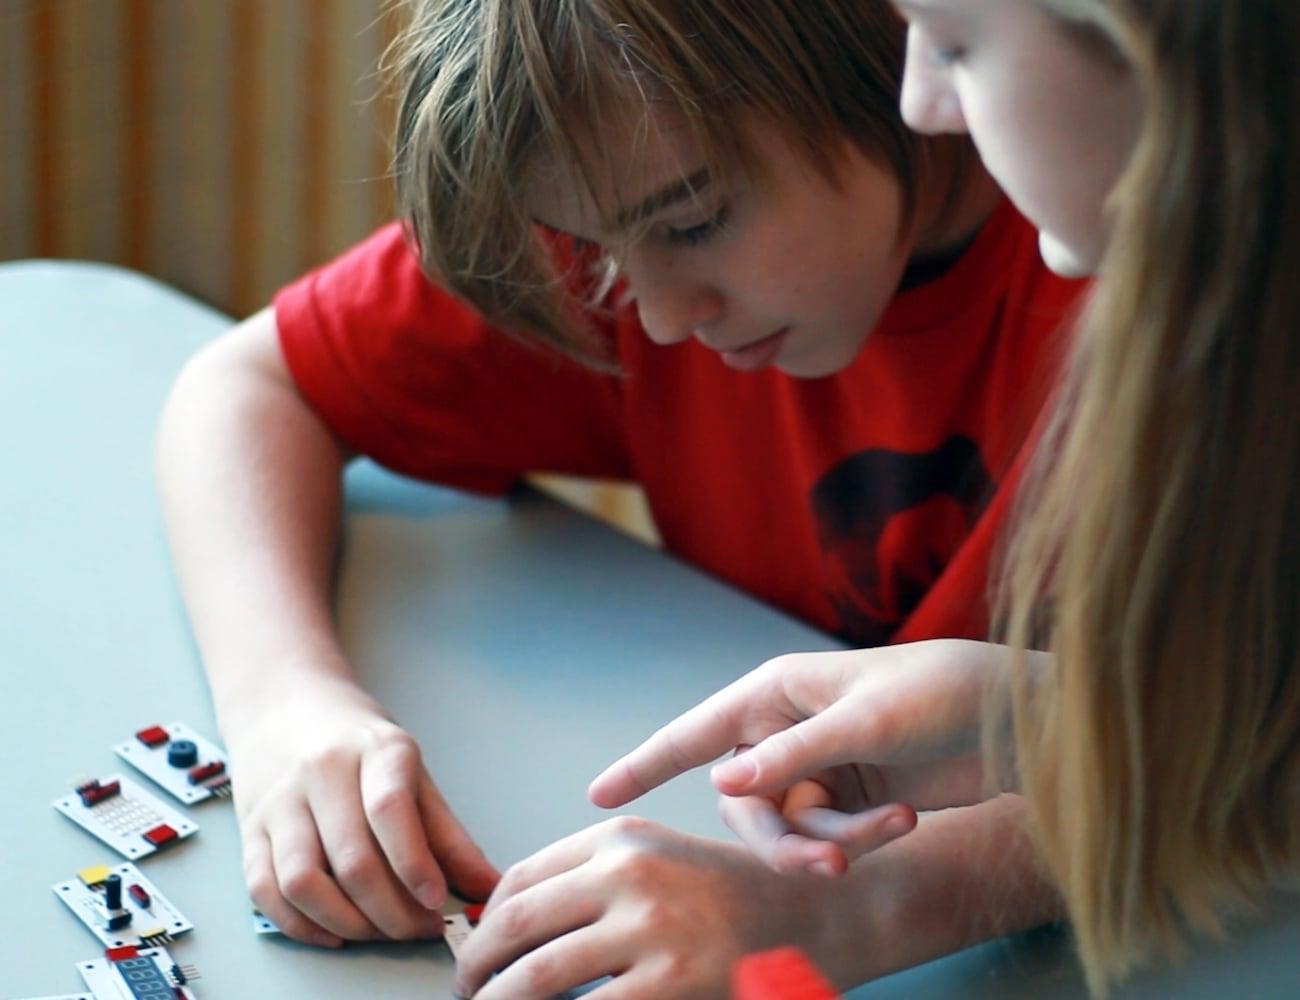 iBrics Imagination Kit Intelligent Building Blocks